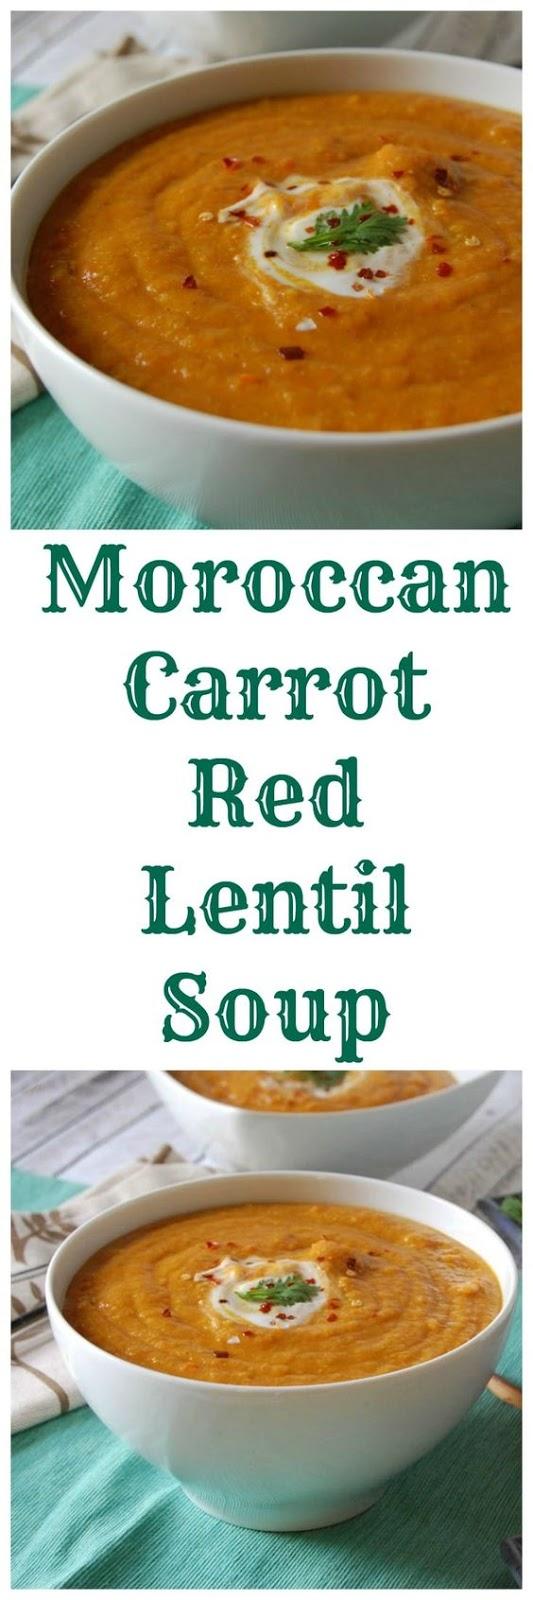 Moroccan Carrot Red Lentil Soup | CUCINA DE YUNG